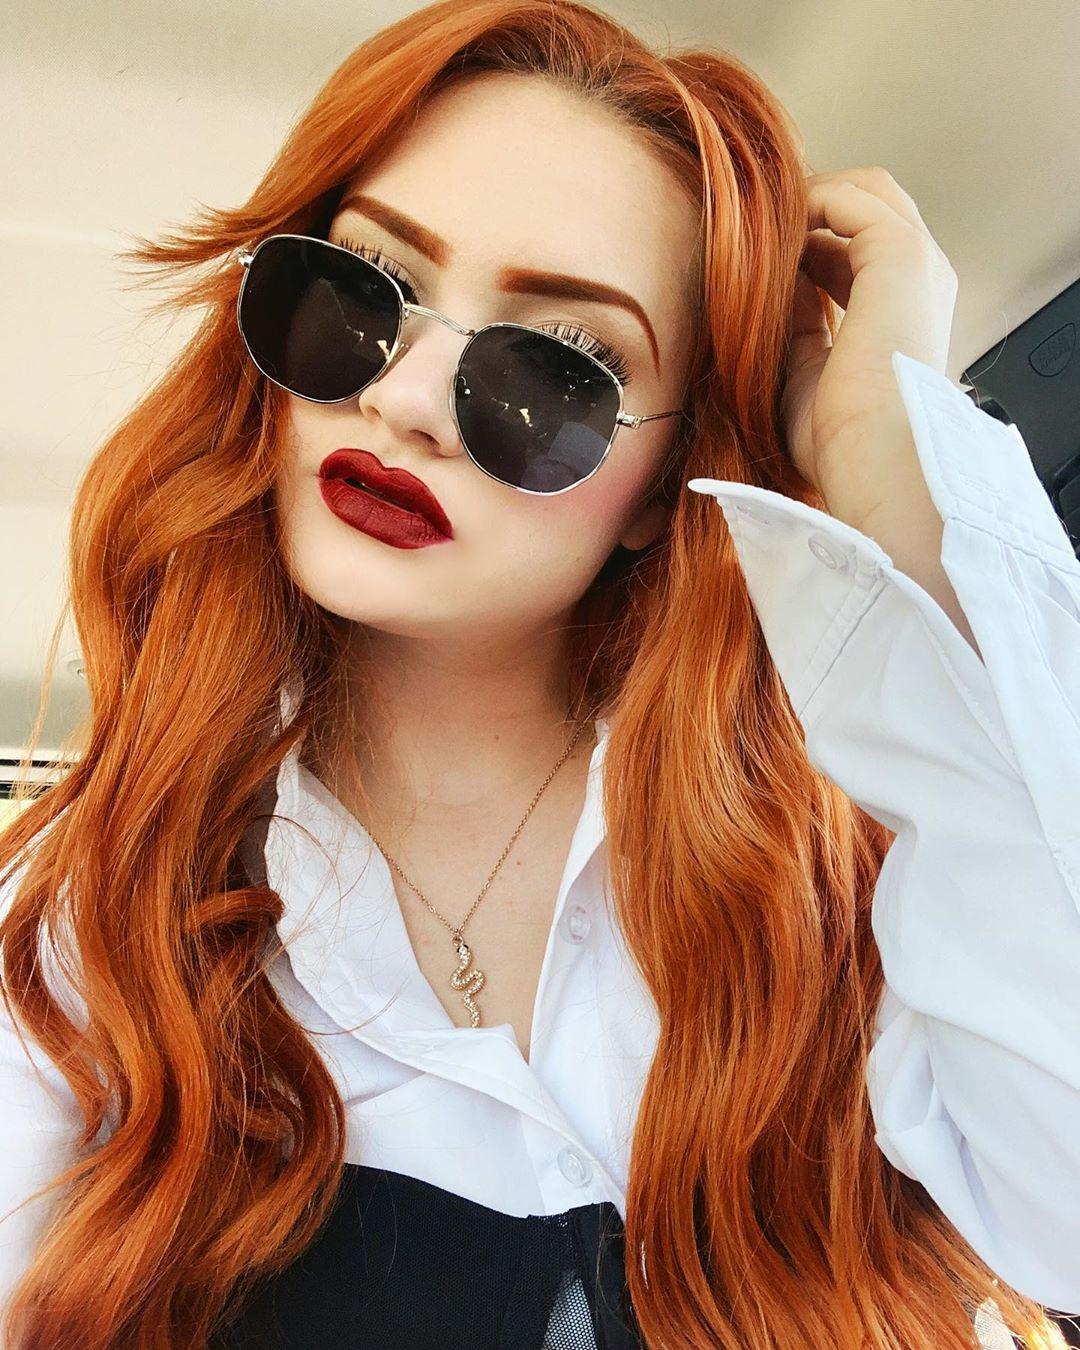 Woman with long, wavy pumpkin spice hair